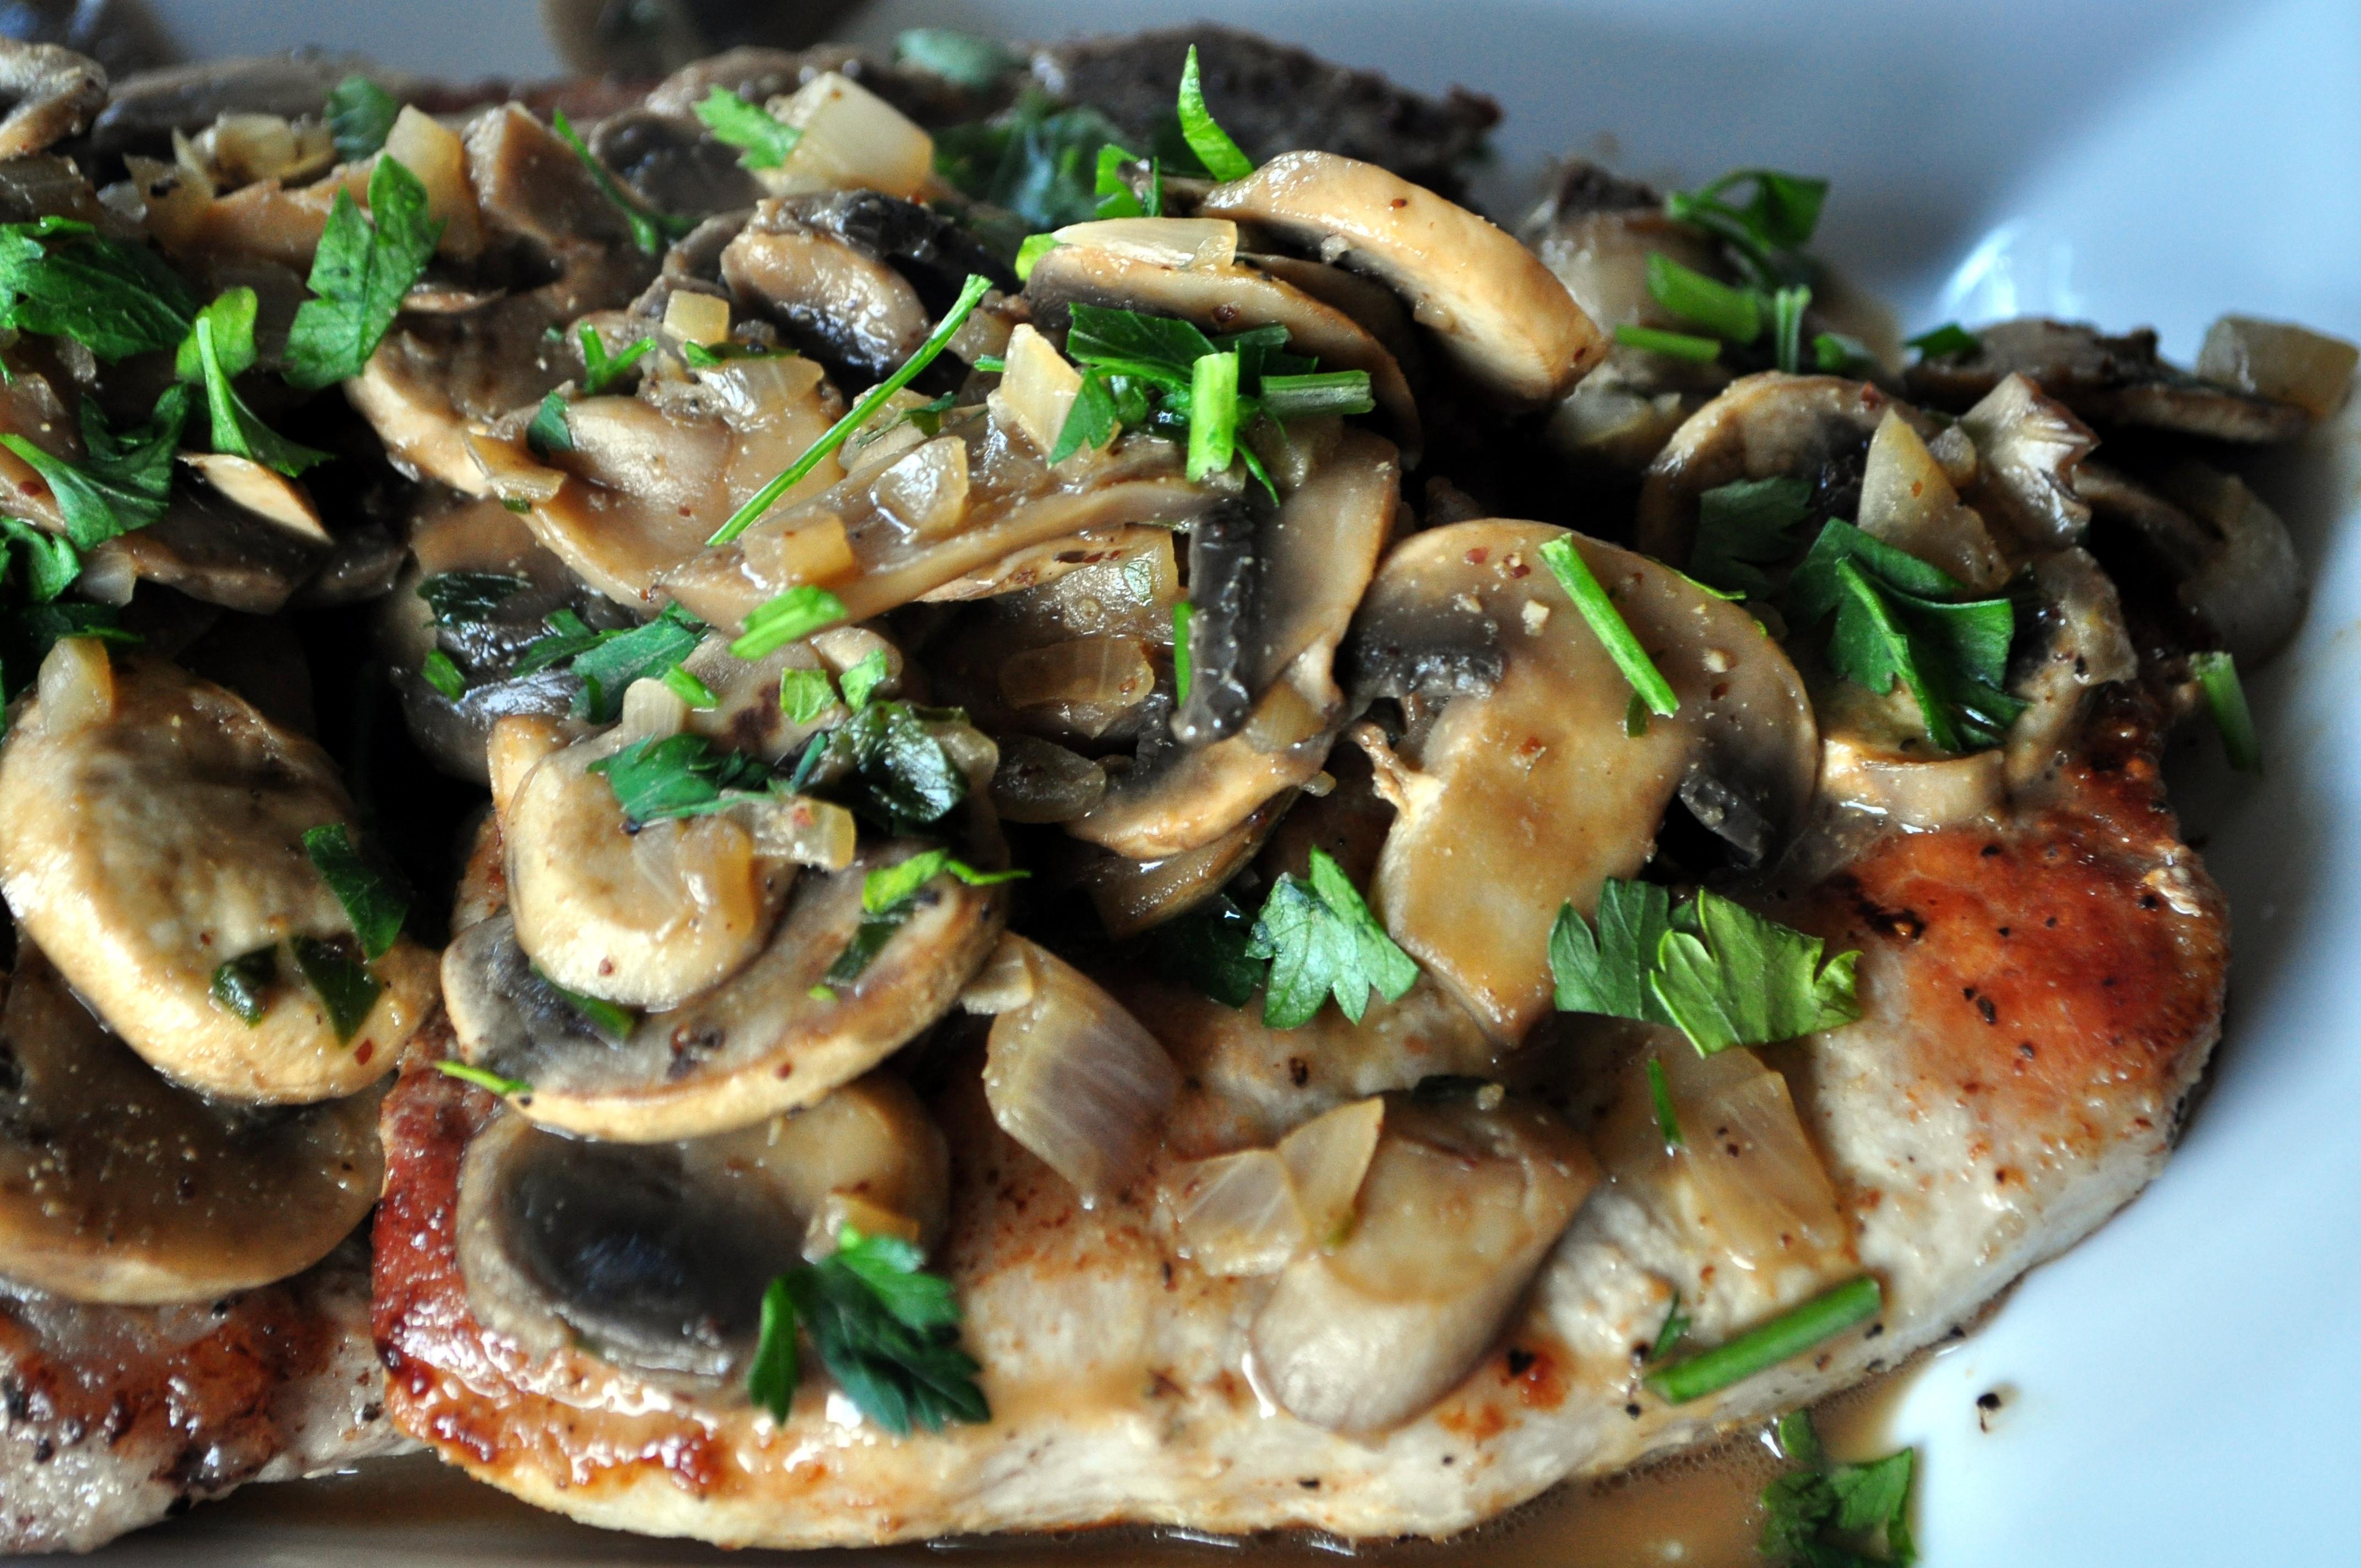 Pork Chops And Mushrooms  pork chops with mushrooms